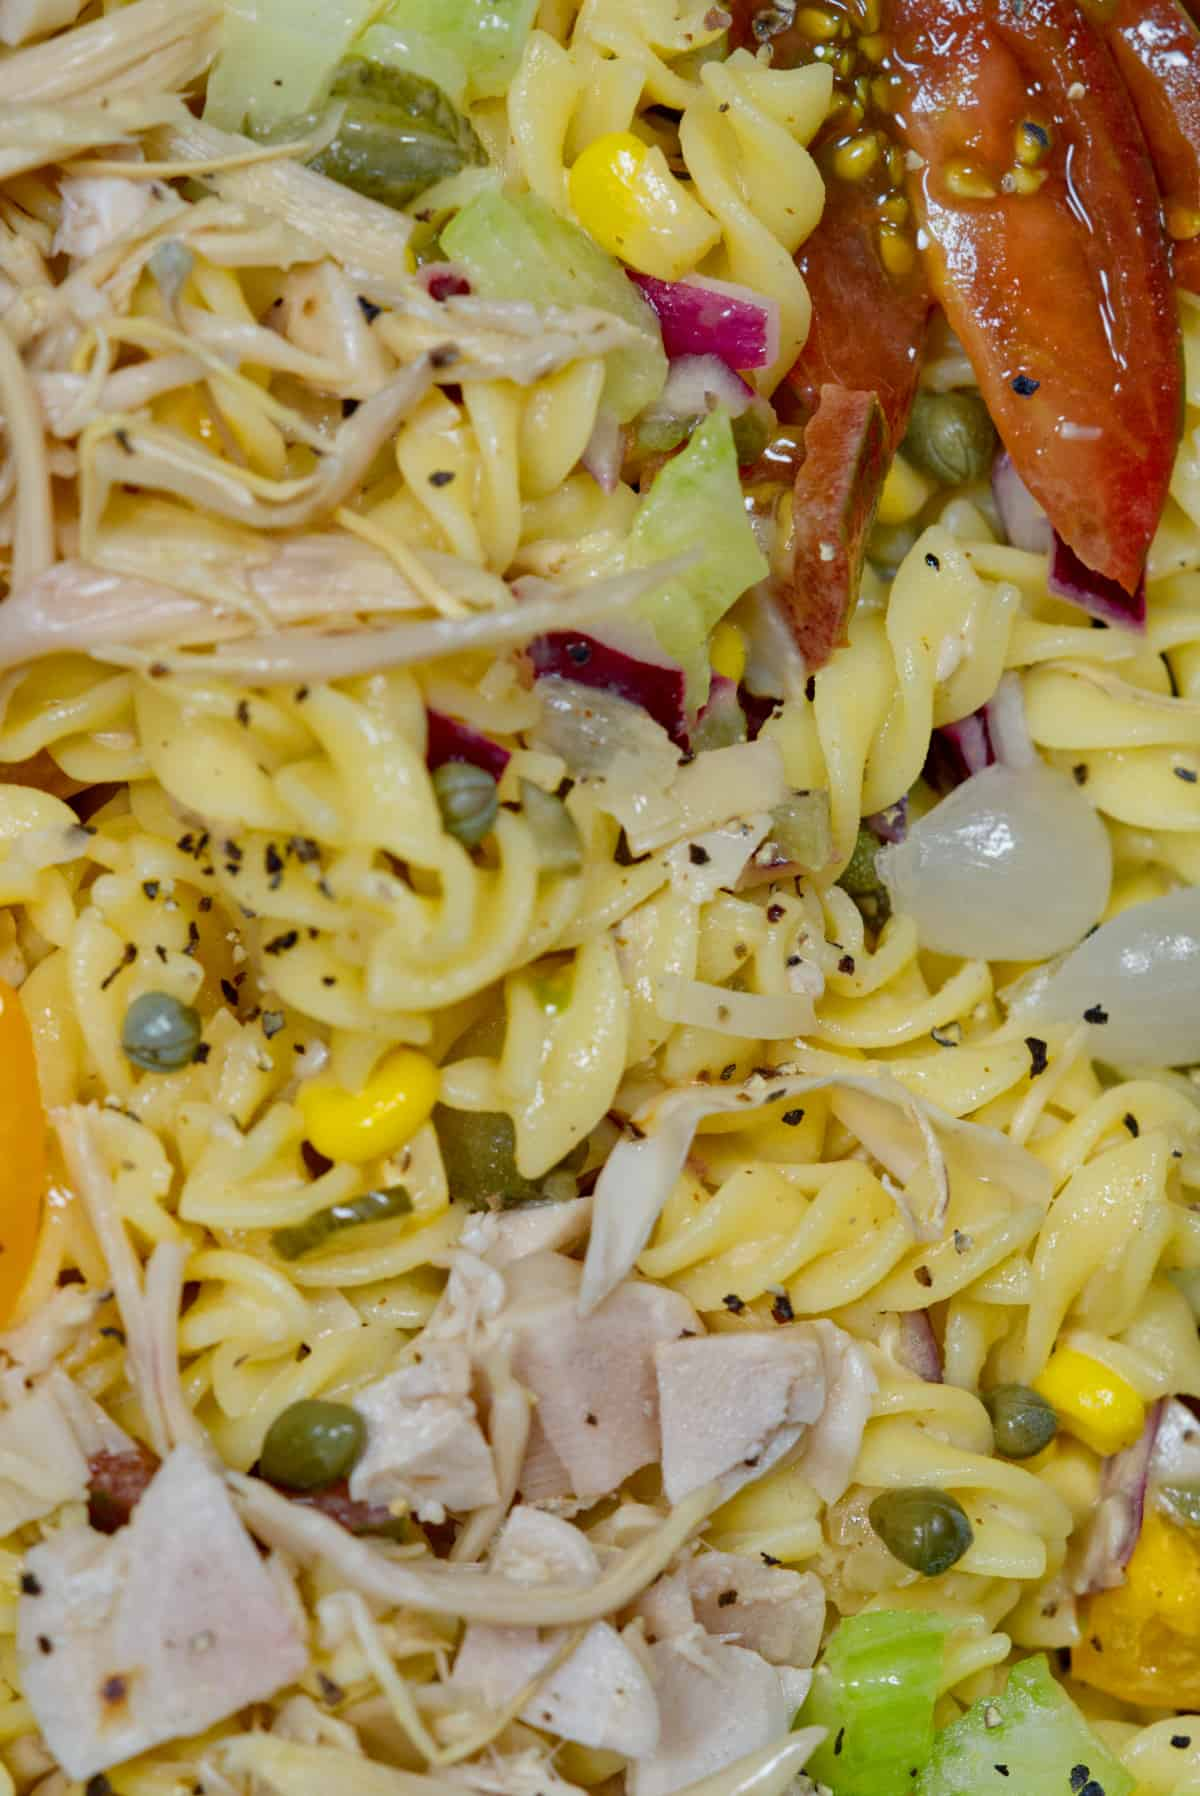 vegan pasta salad up close with banana blossom chopped up